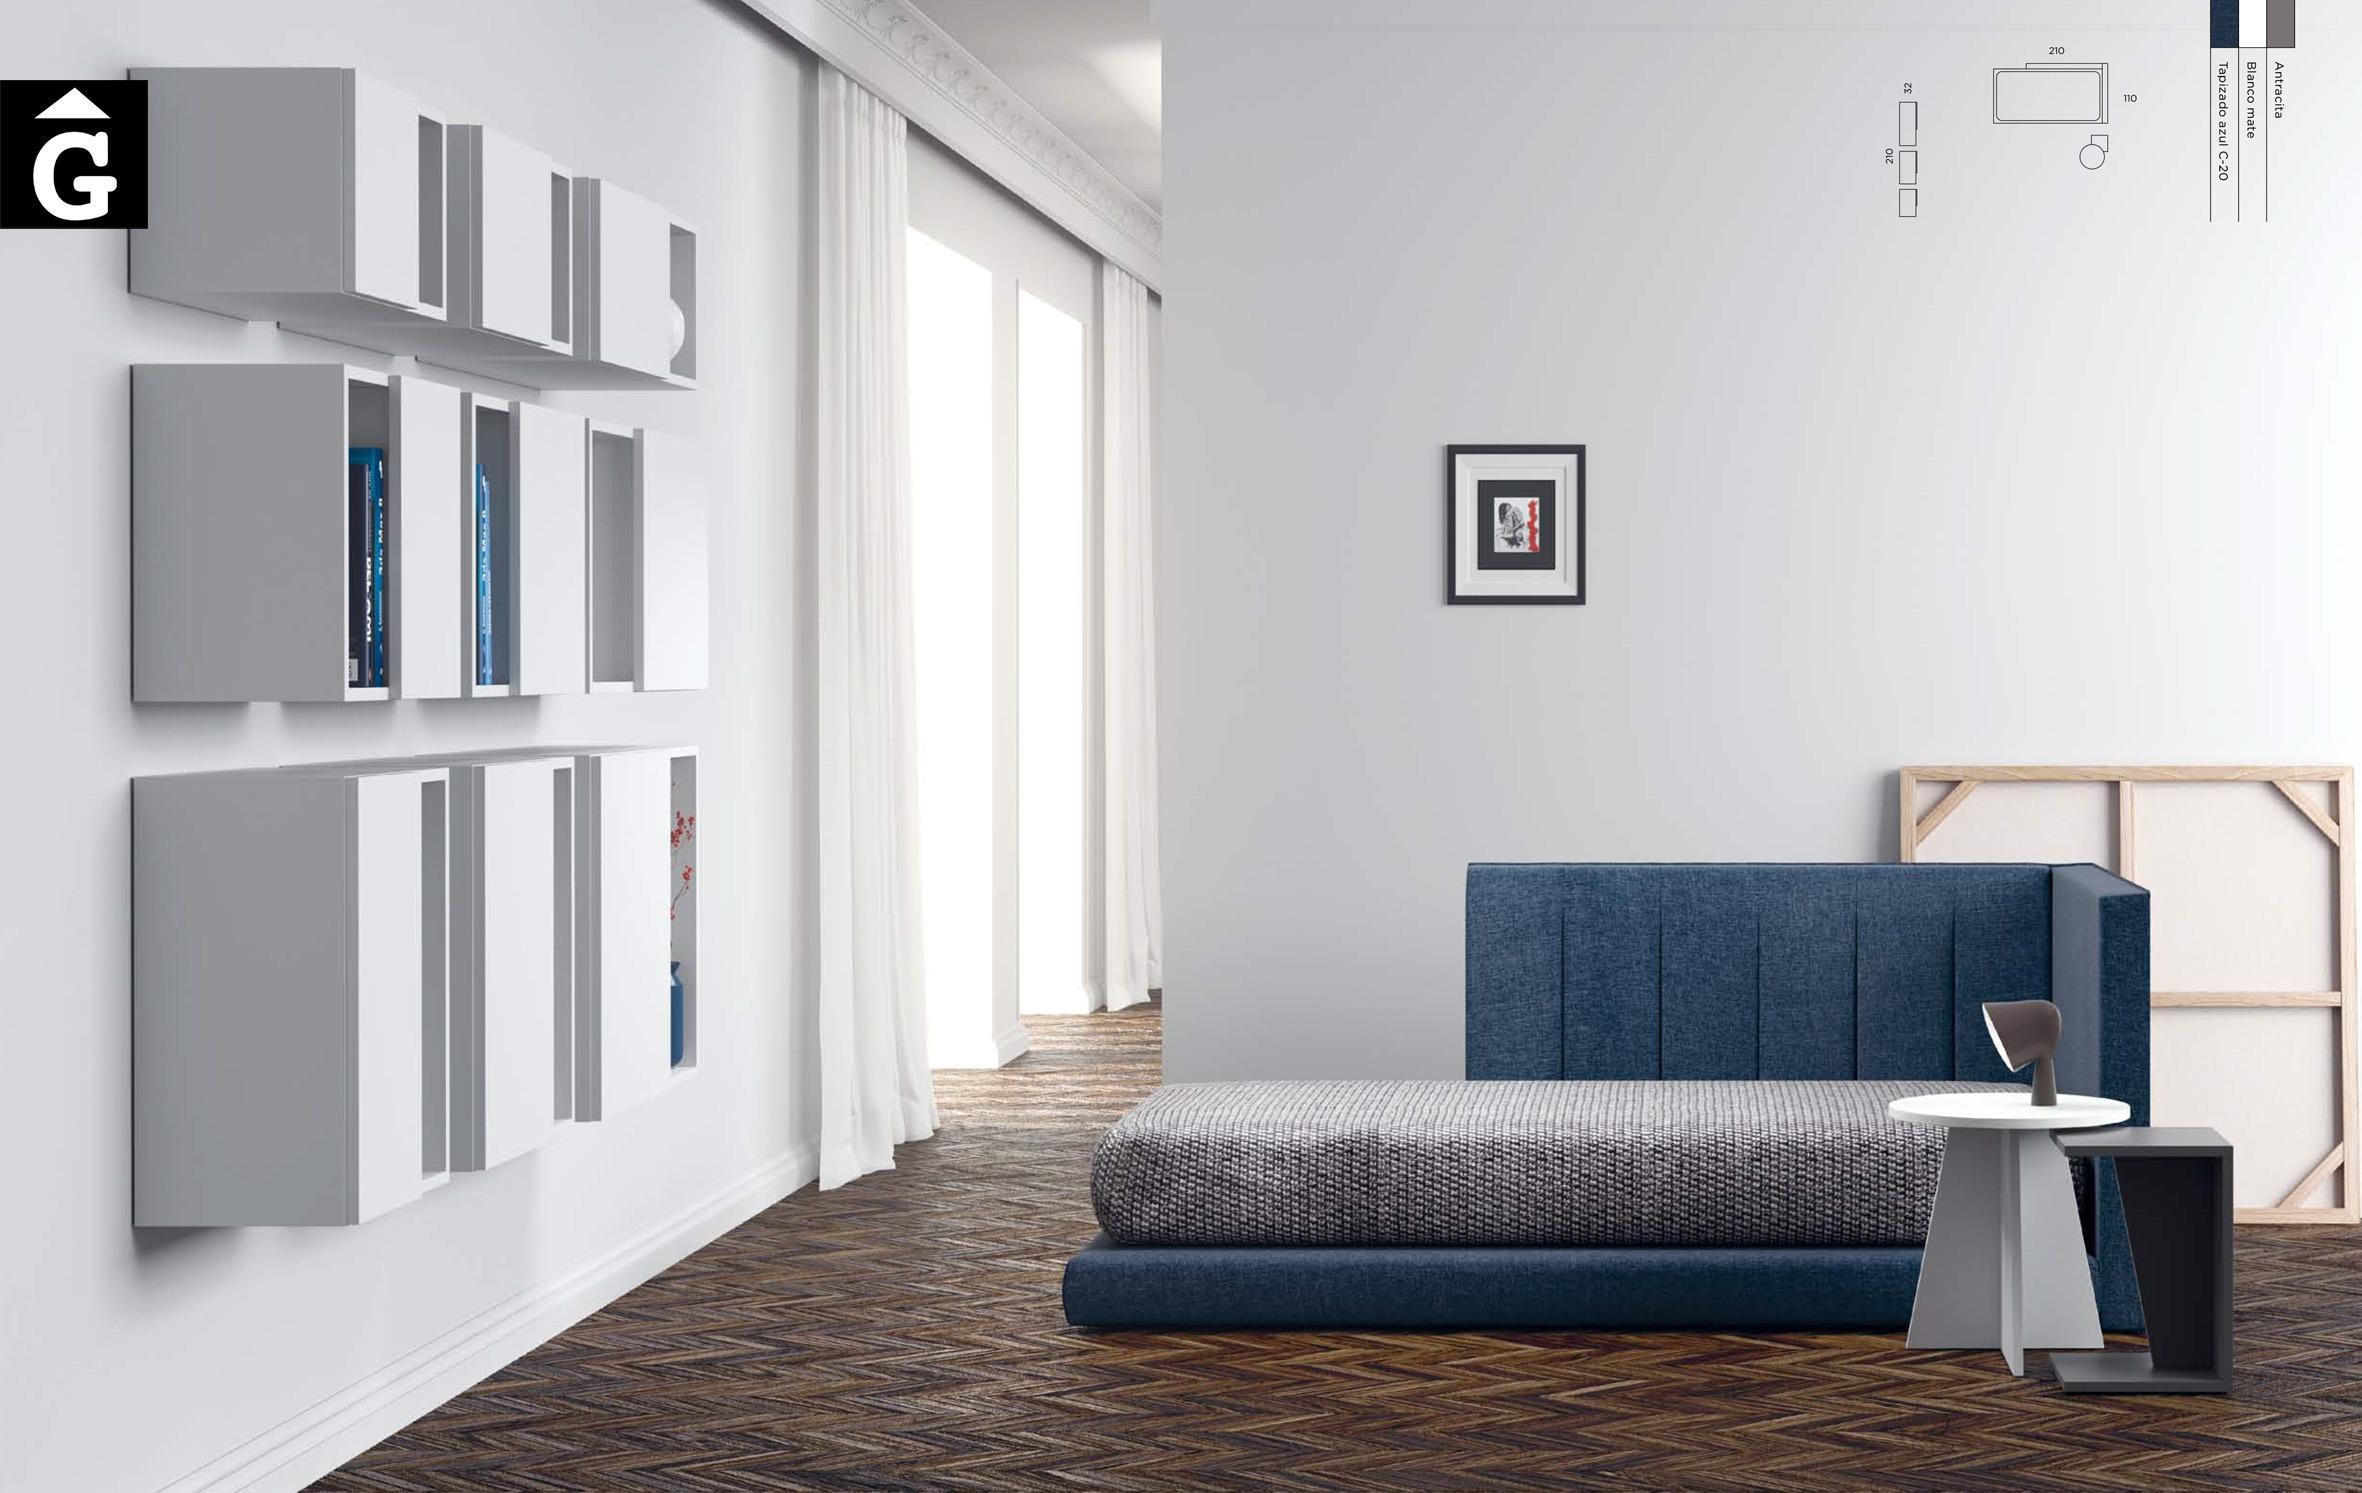 Llit Tatami tapissat QB NEXT Tegar by nobles GIFREU Girona modern minim elegant atemporal